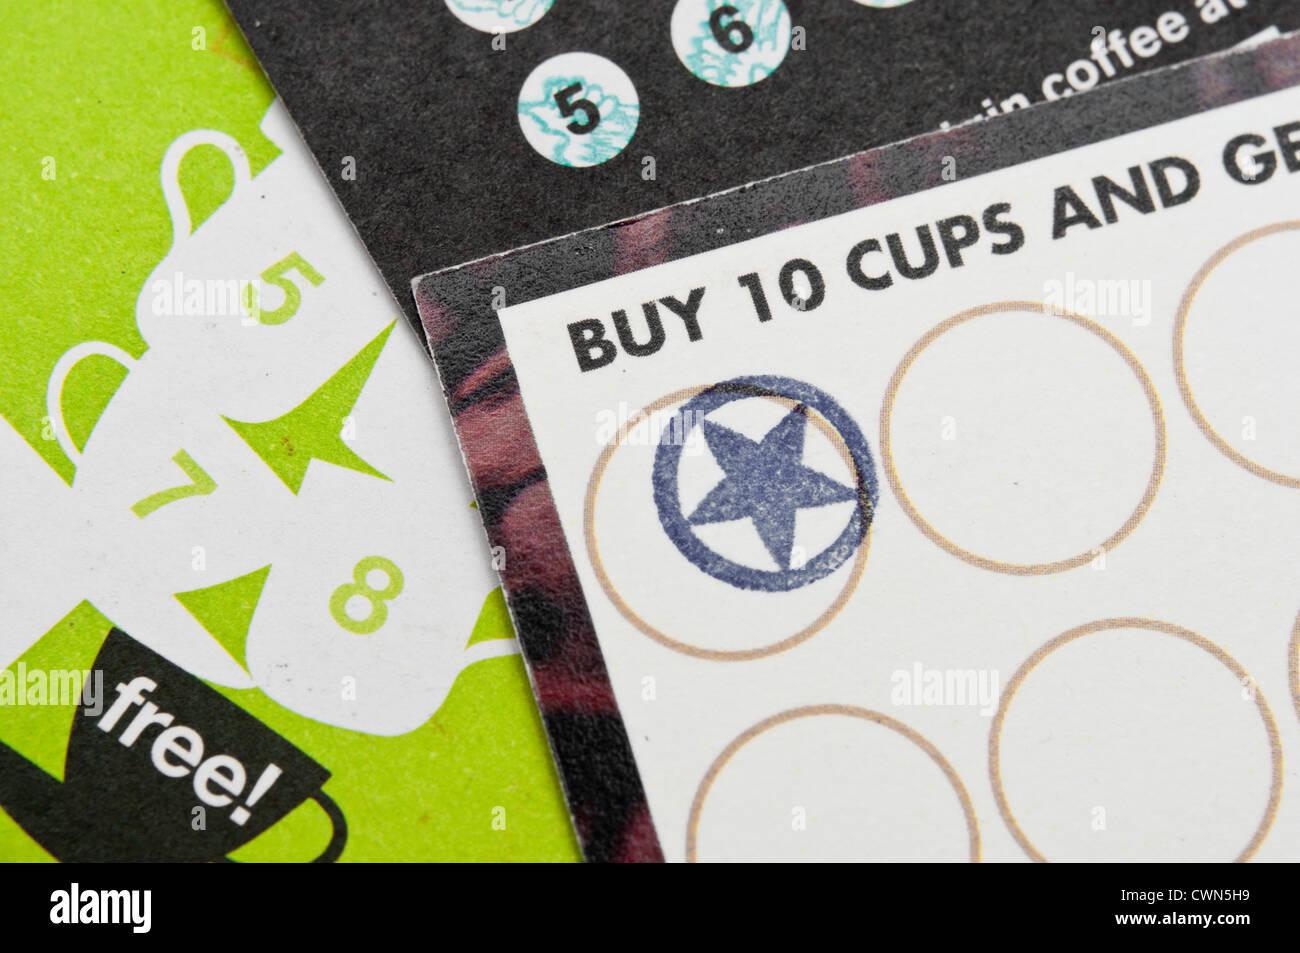 Coffee shop loyalty reward cards. - Stock Image